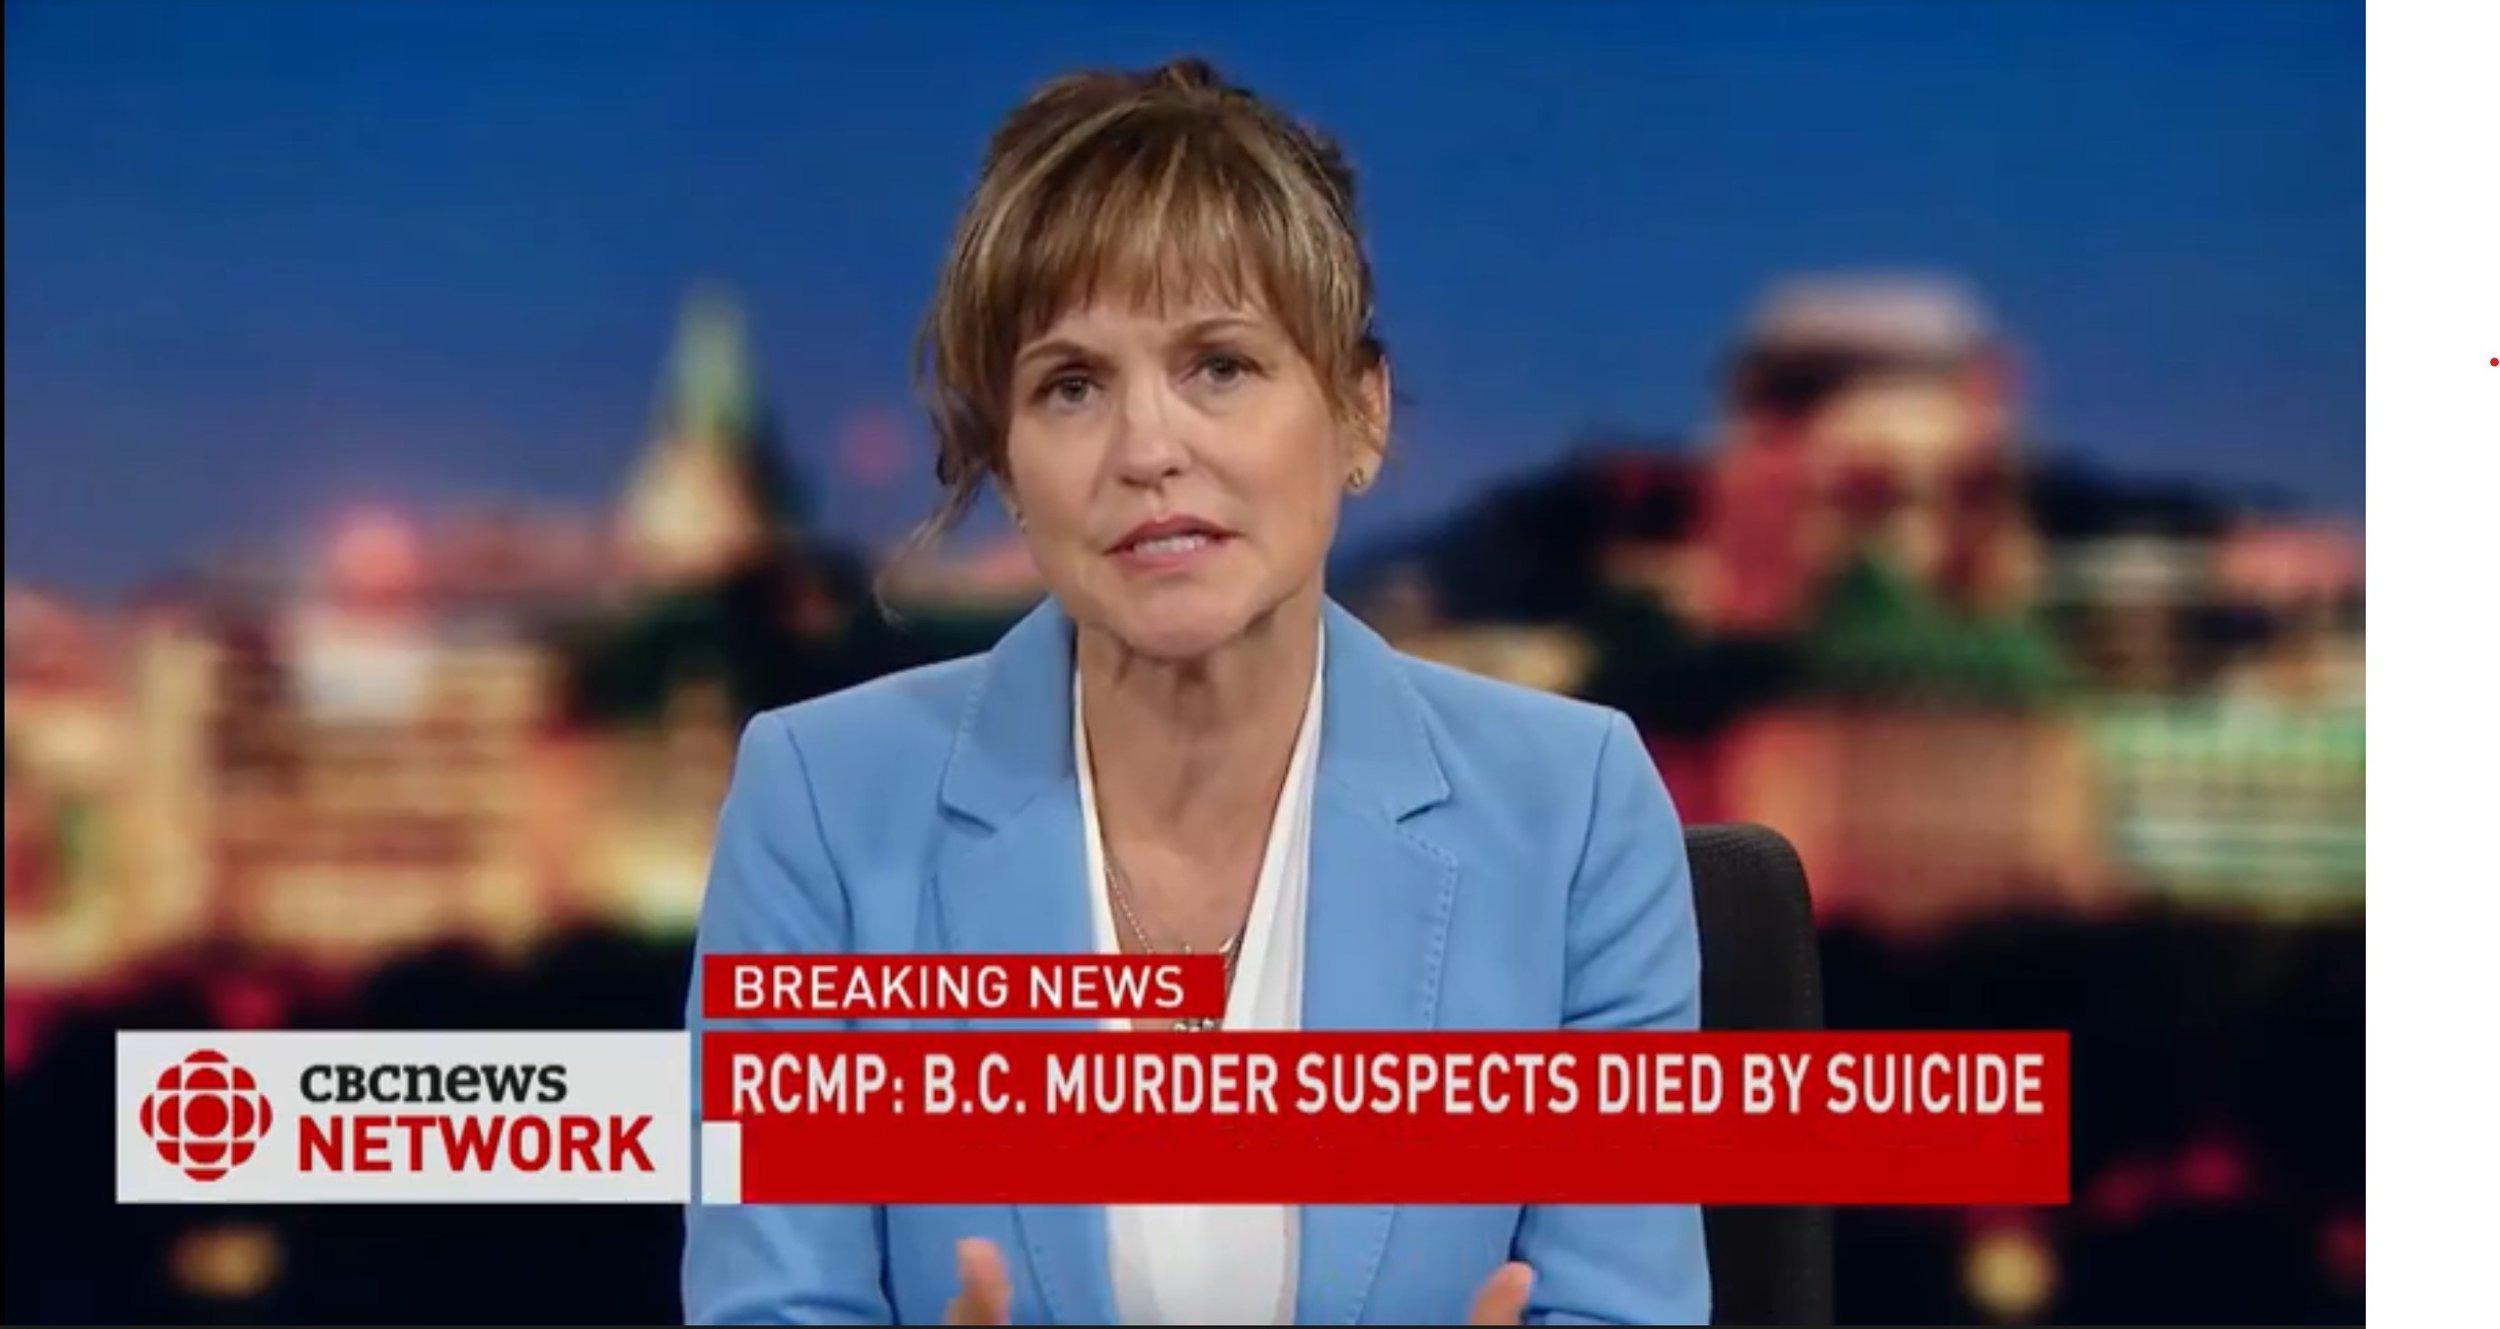 EN - CBC National News with Carol McNeil - Autopsy reveals death by suicide | 2019 08 10